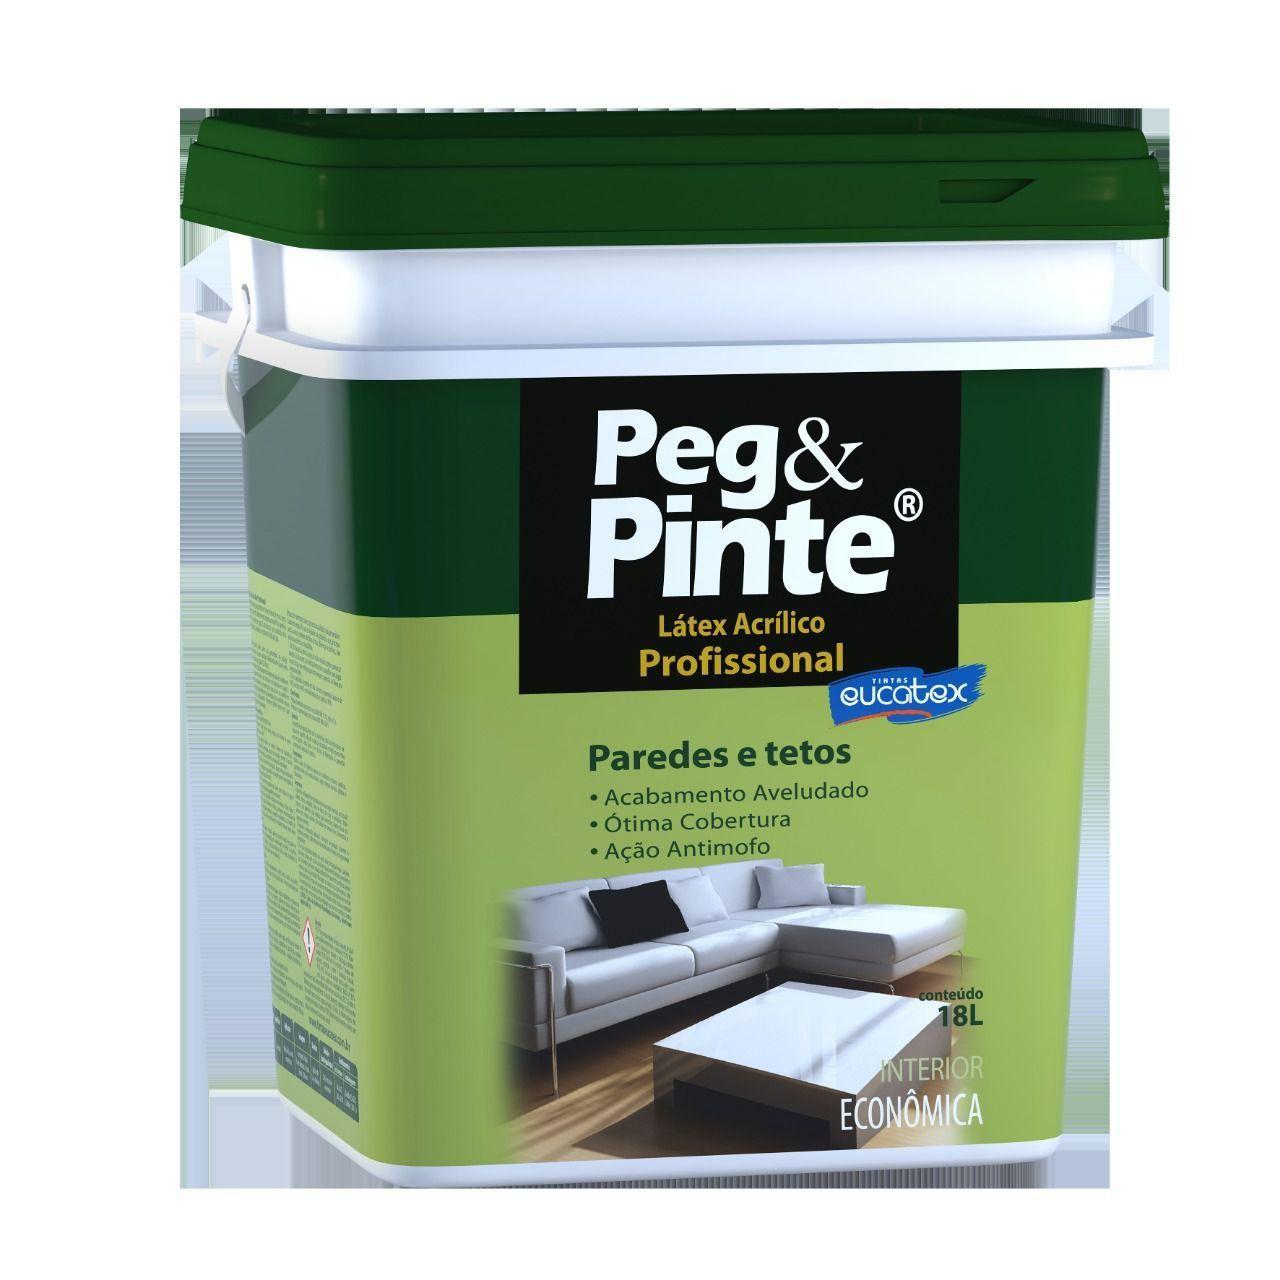 Tinta Peg&Pinte Profissional Latex Acrilico Branco 18 Litros Balde Peg Pinte